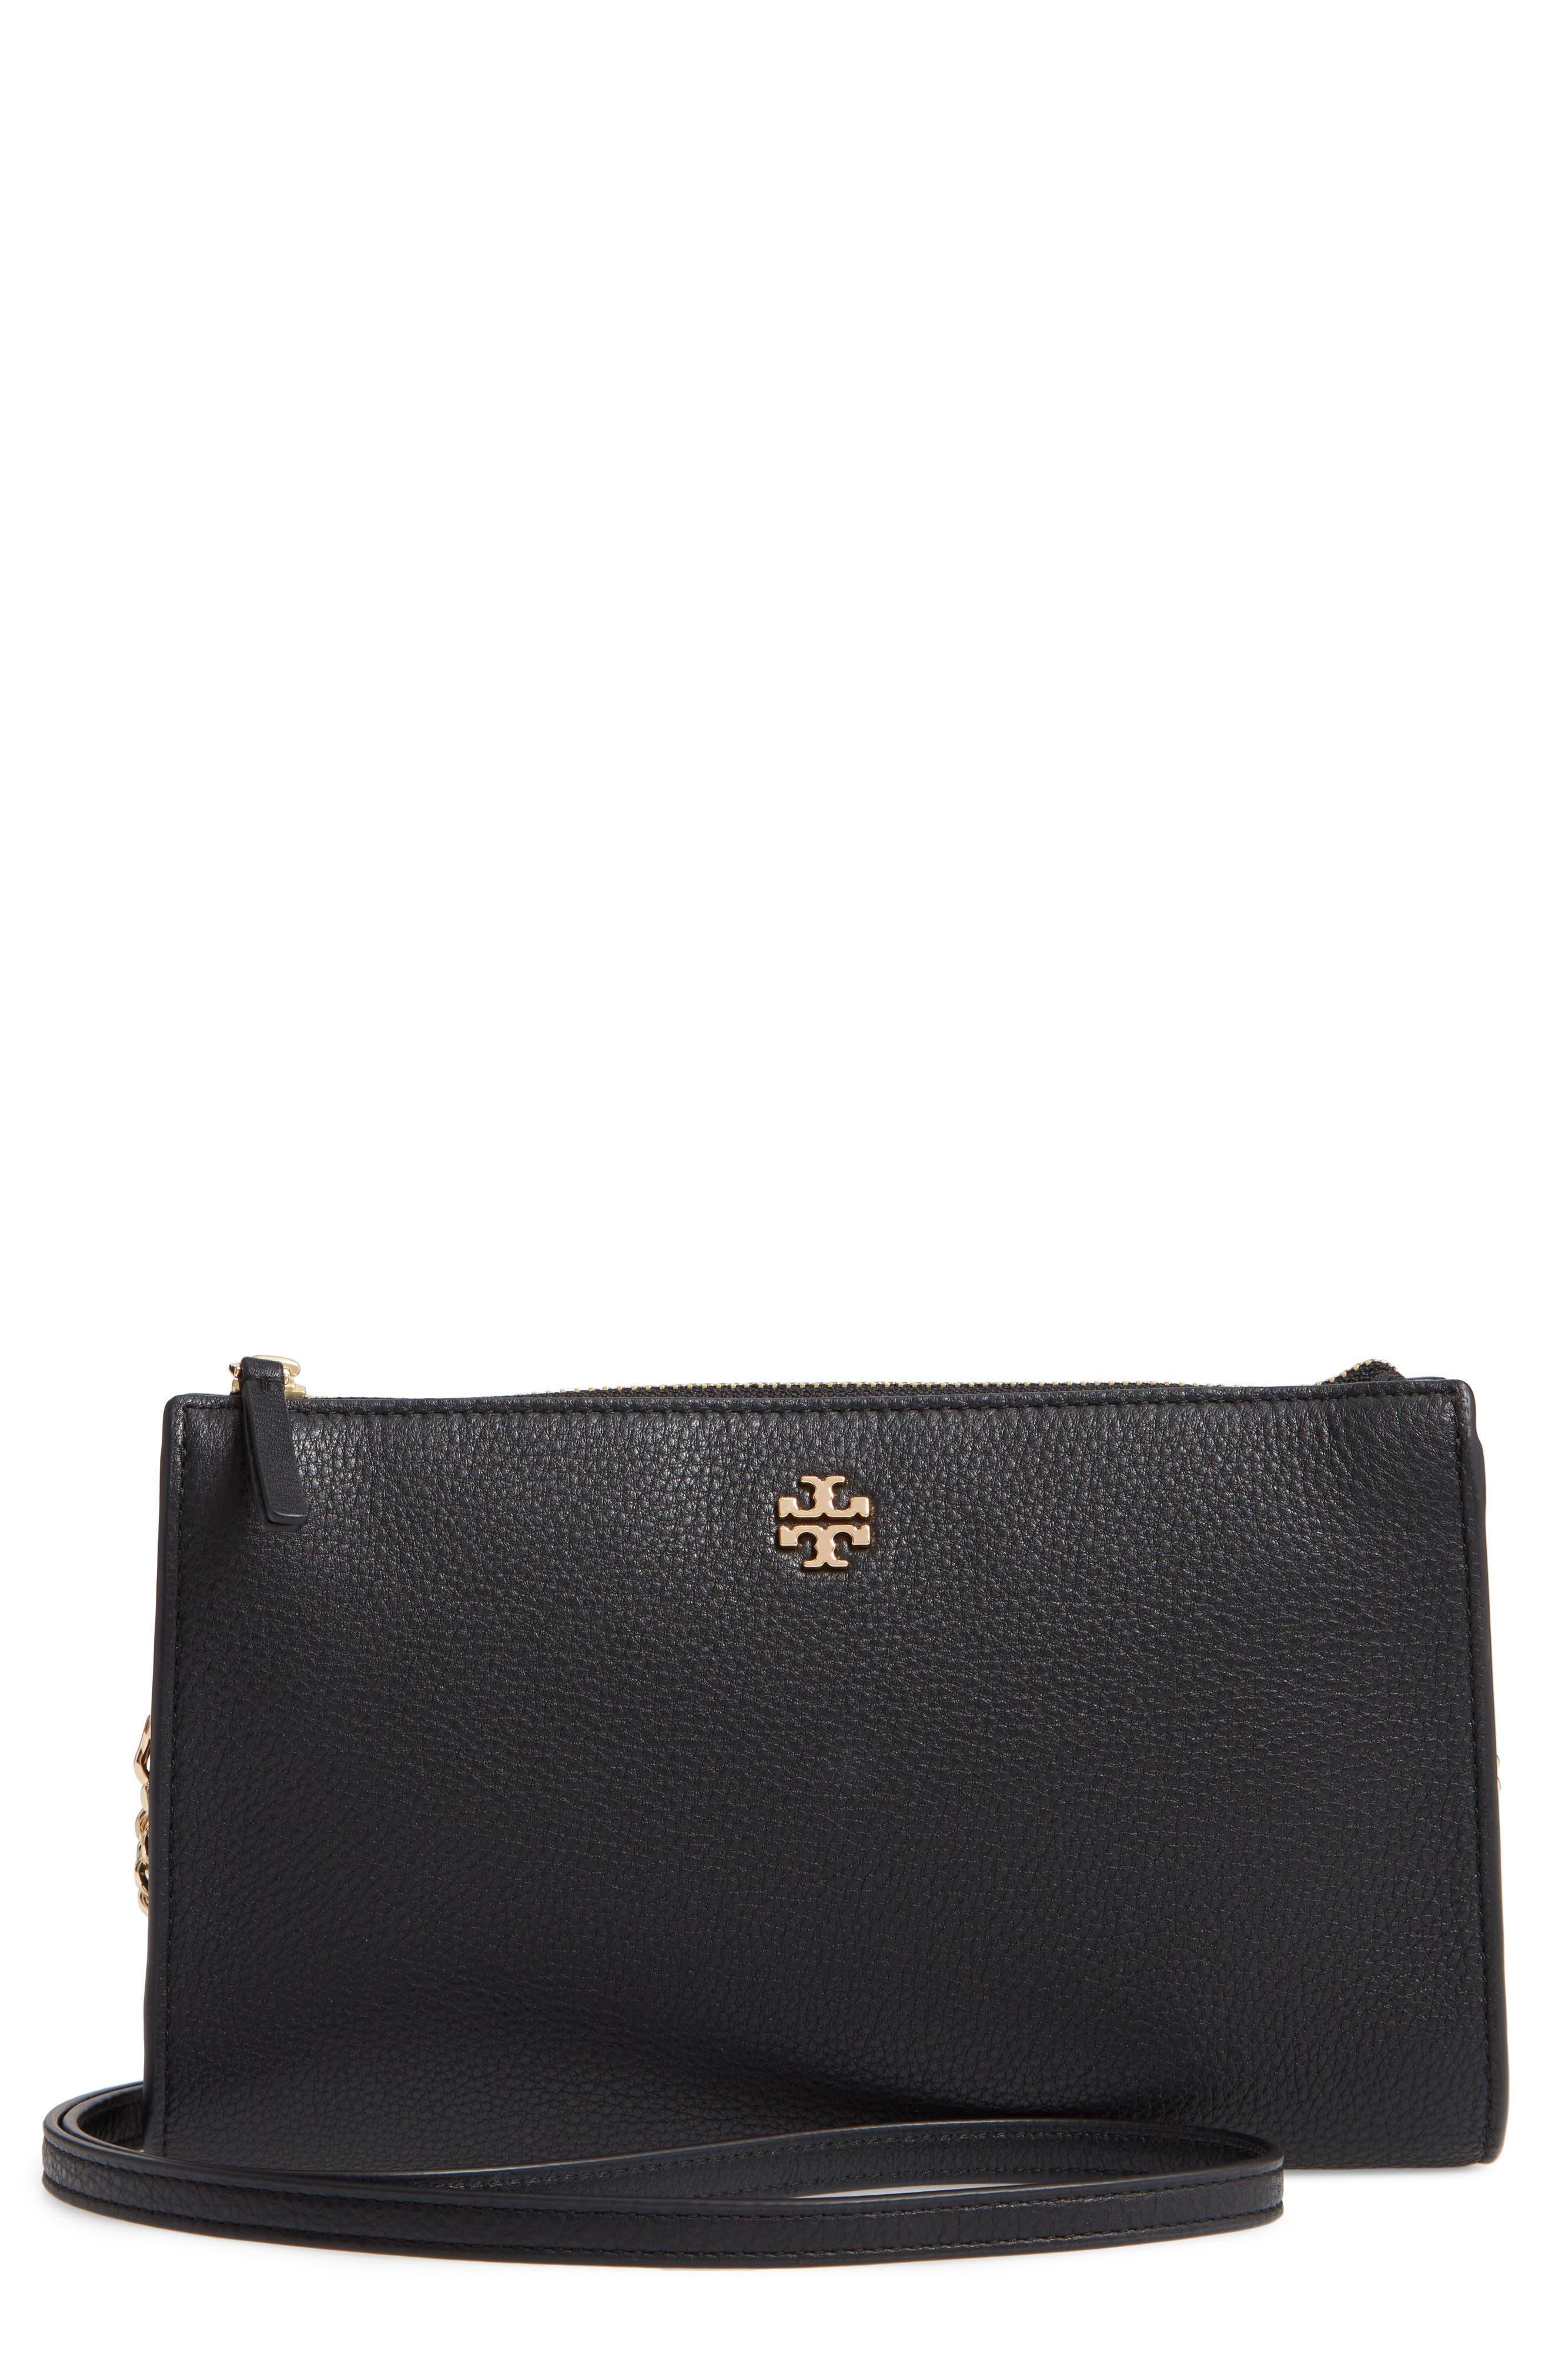 TORY BURCH,                             Pebbled Leather Top Zip Crossbody Bag,                             Main thumbnail 1, color,                             BLACK